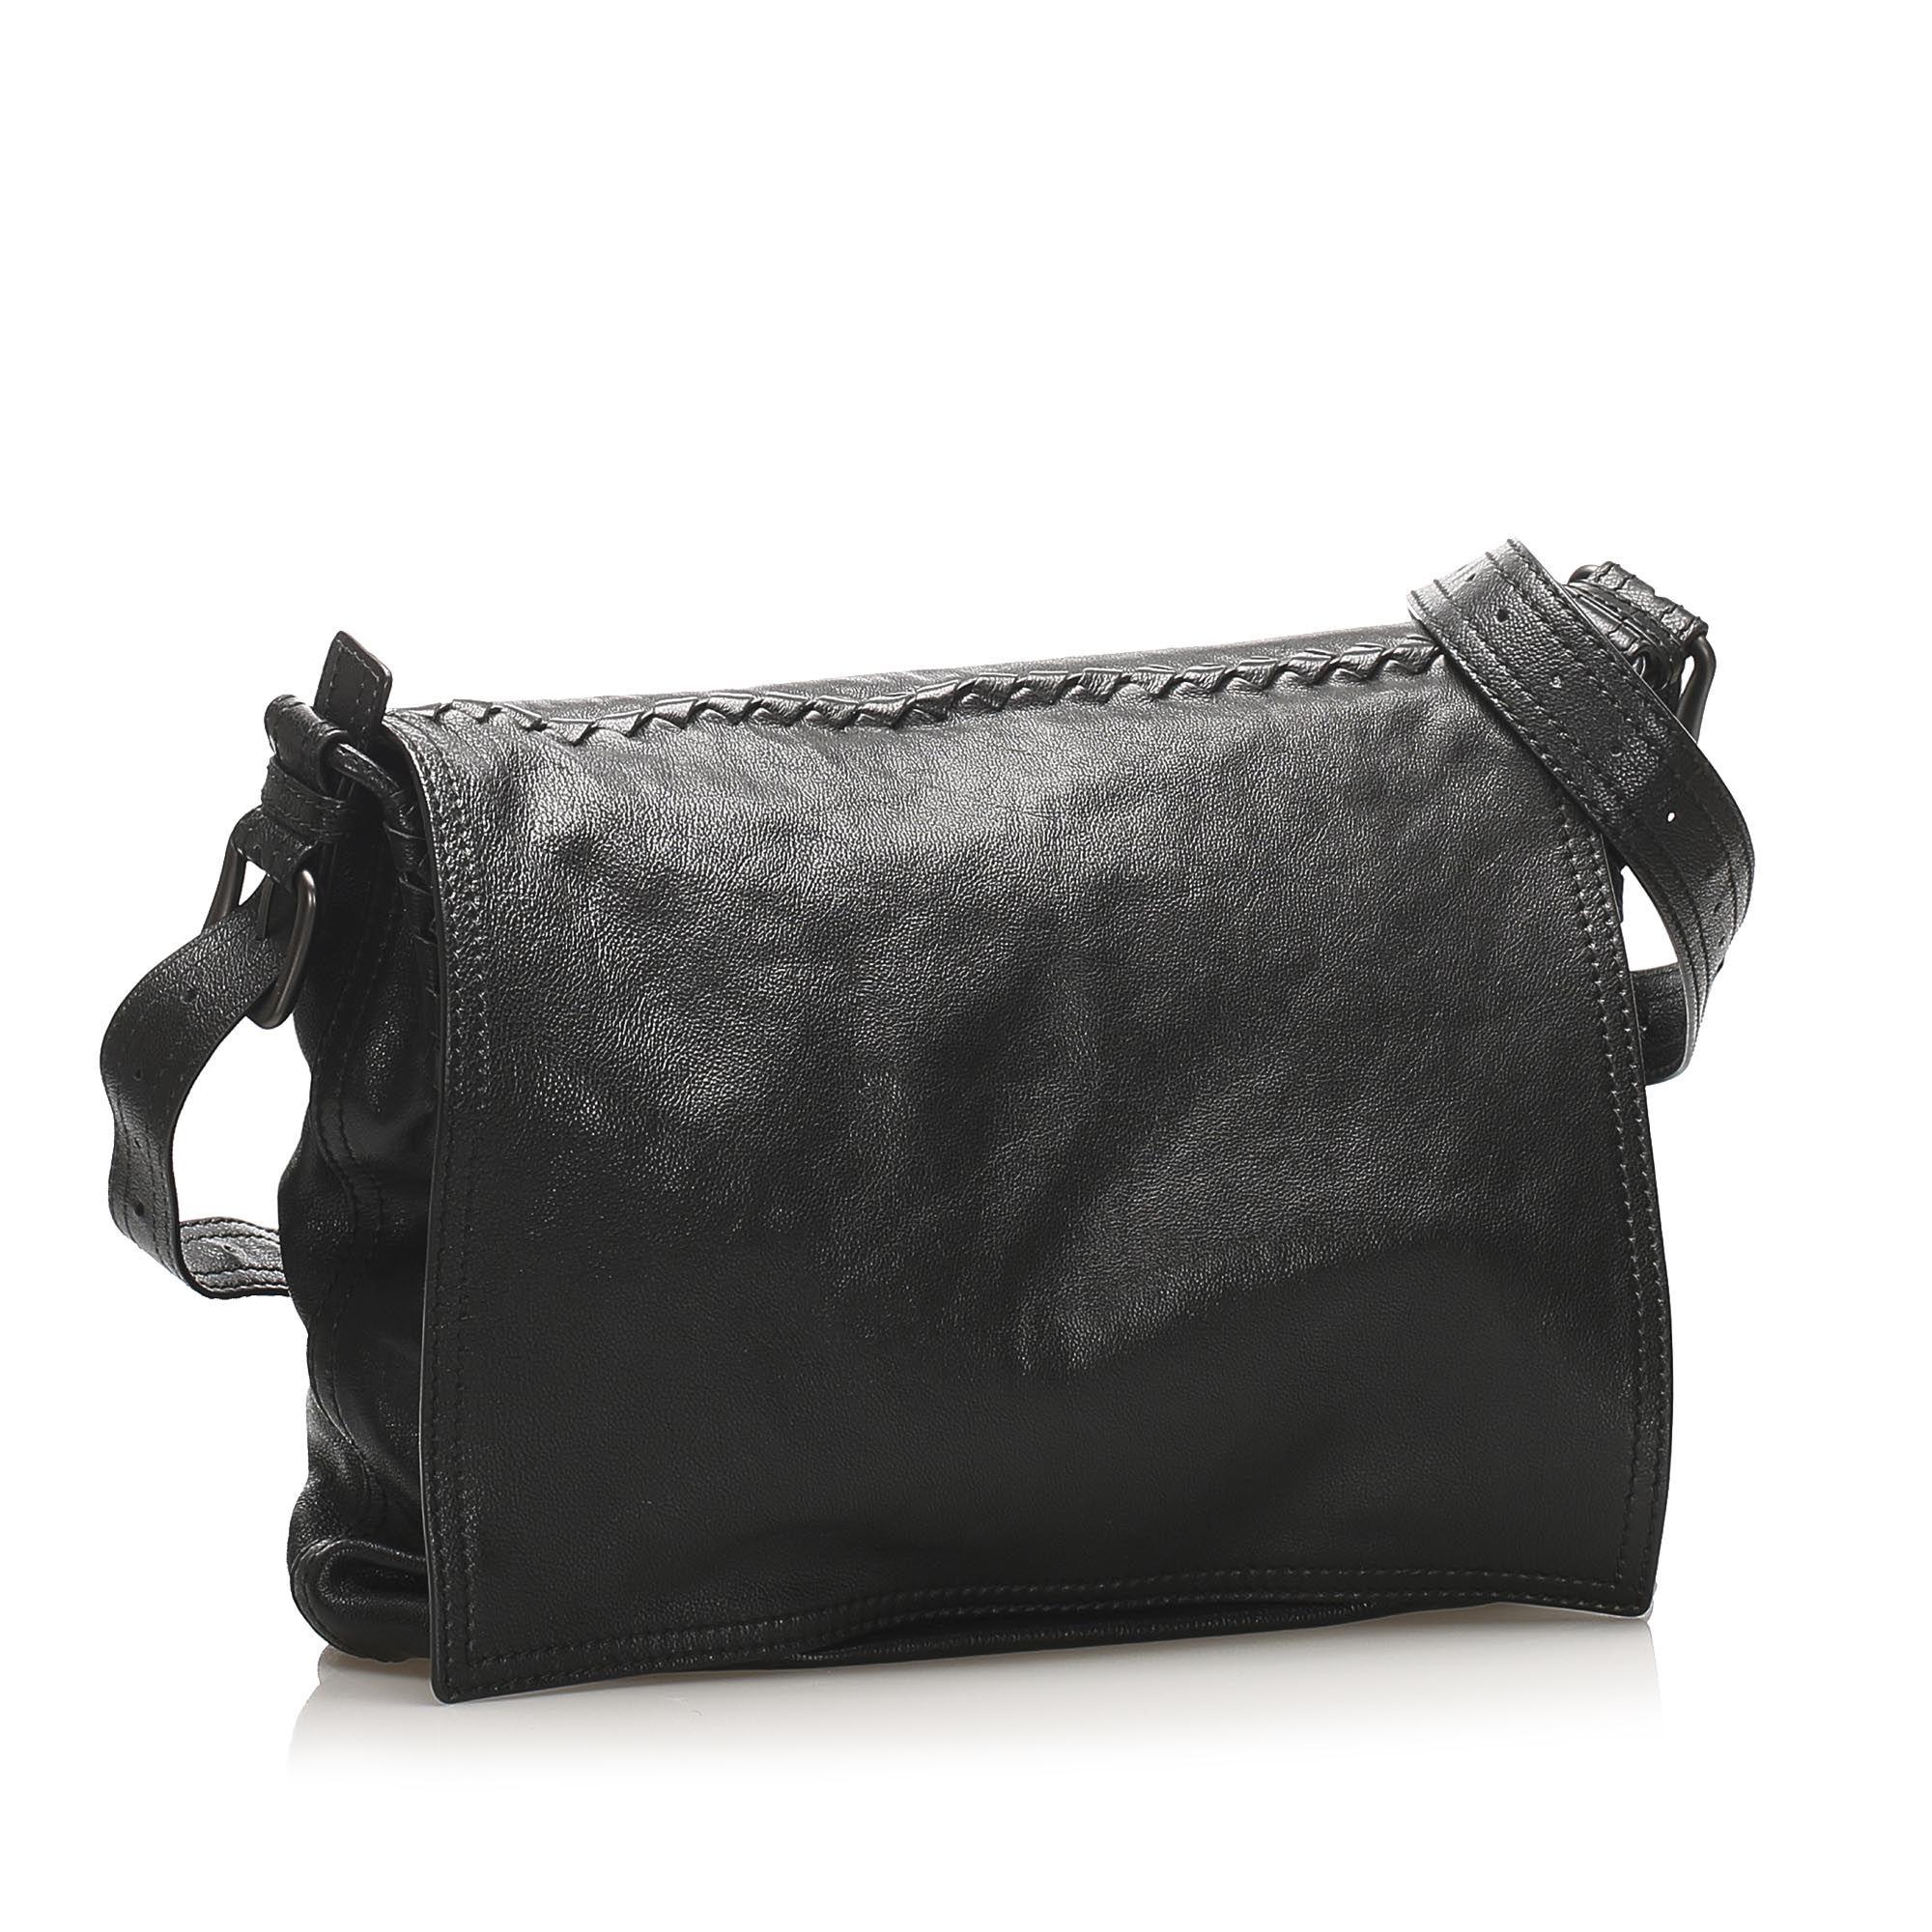 Vintage Bottega Veneta Intrecciato Leather Crossbody Bag Black